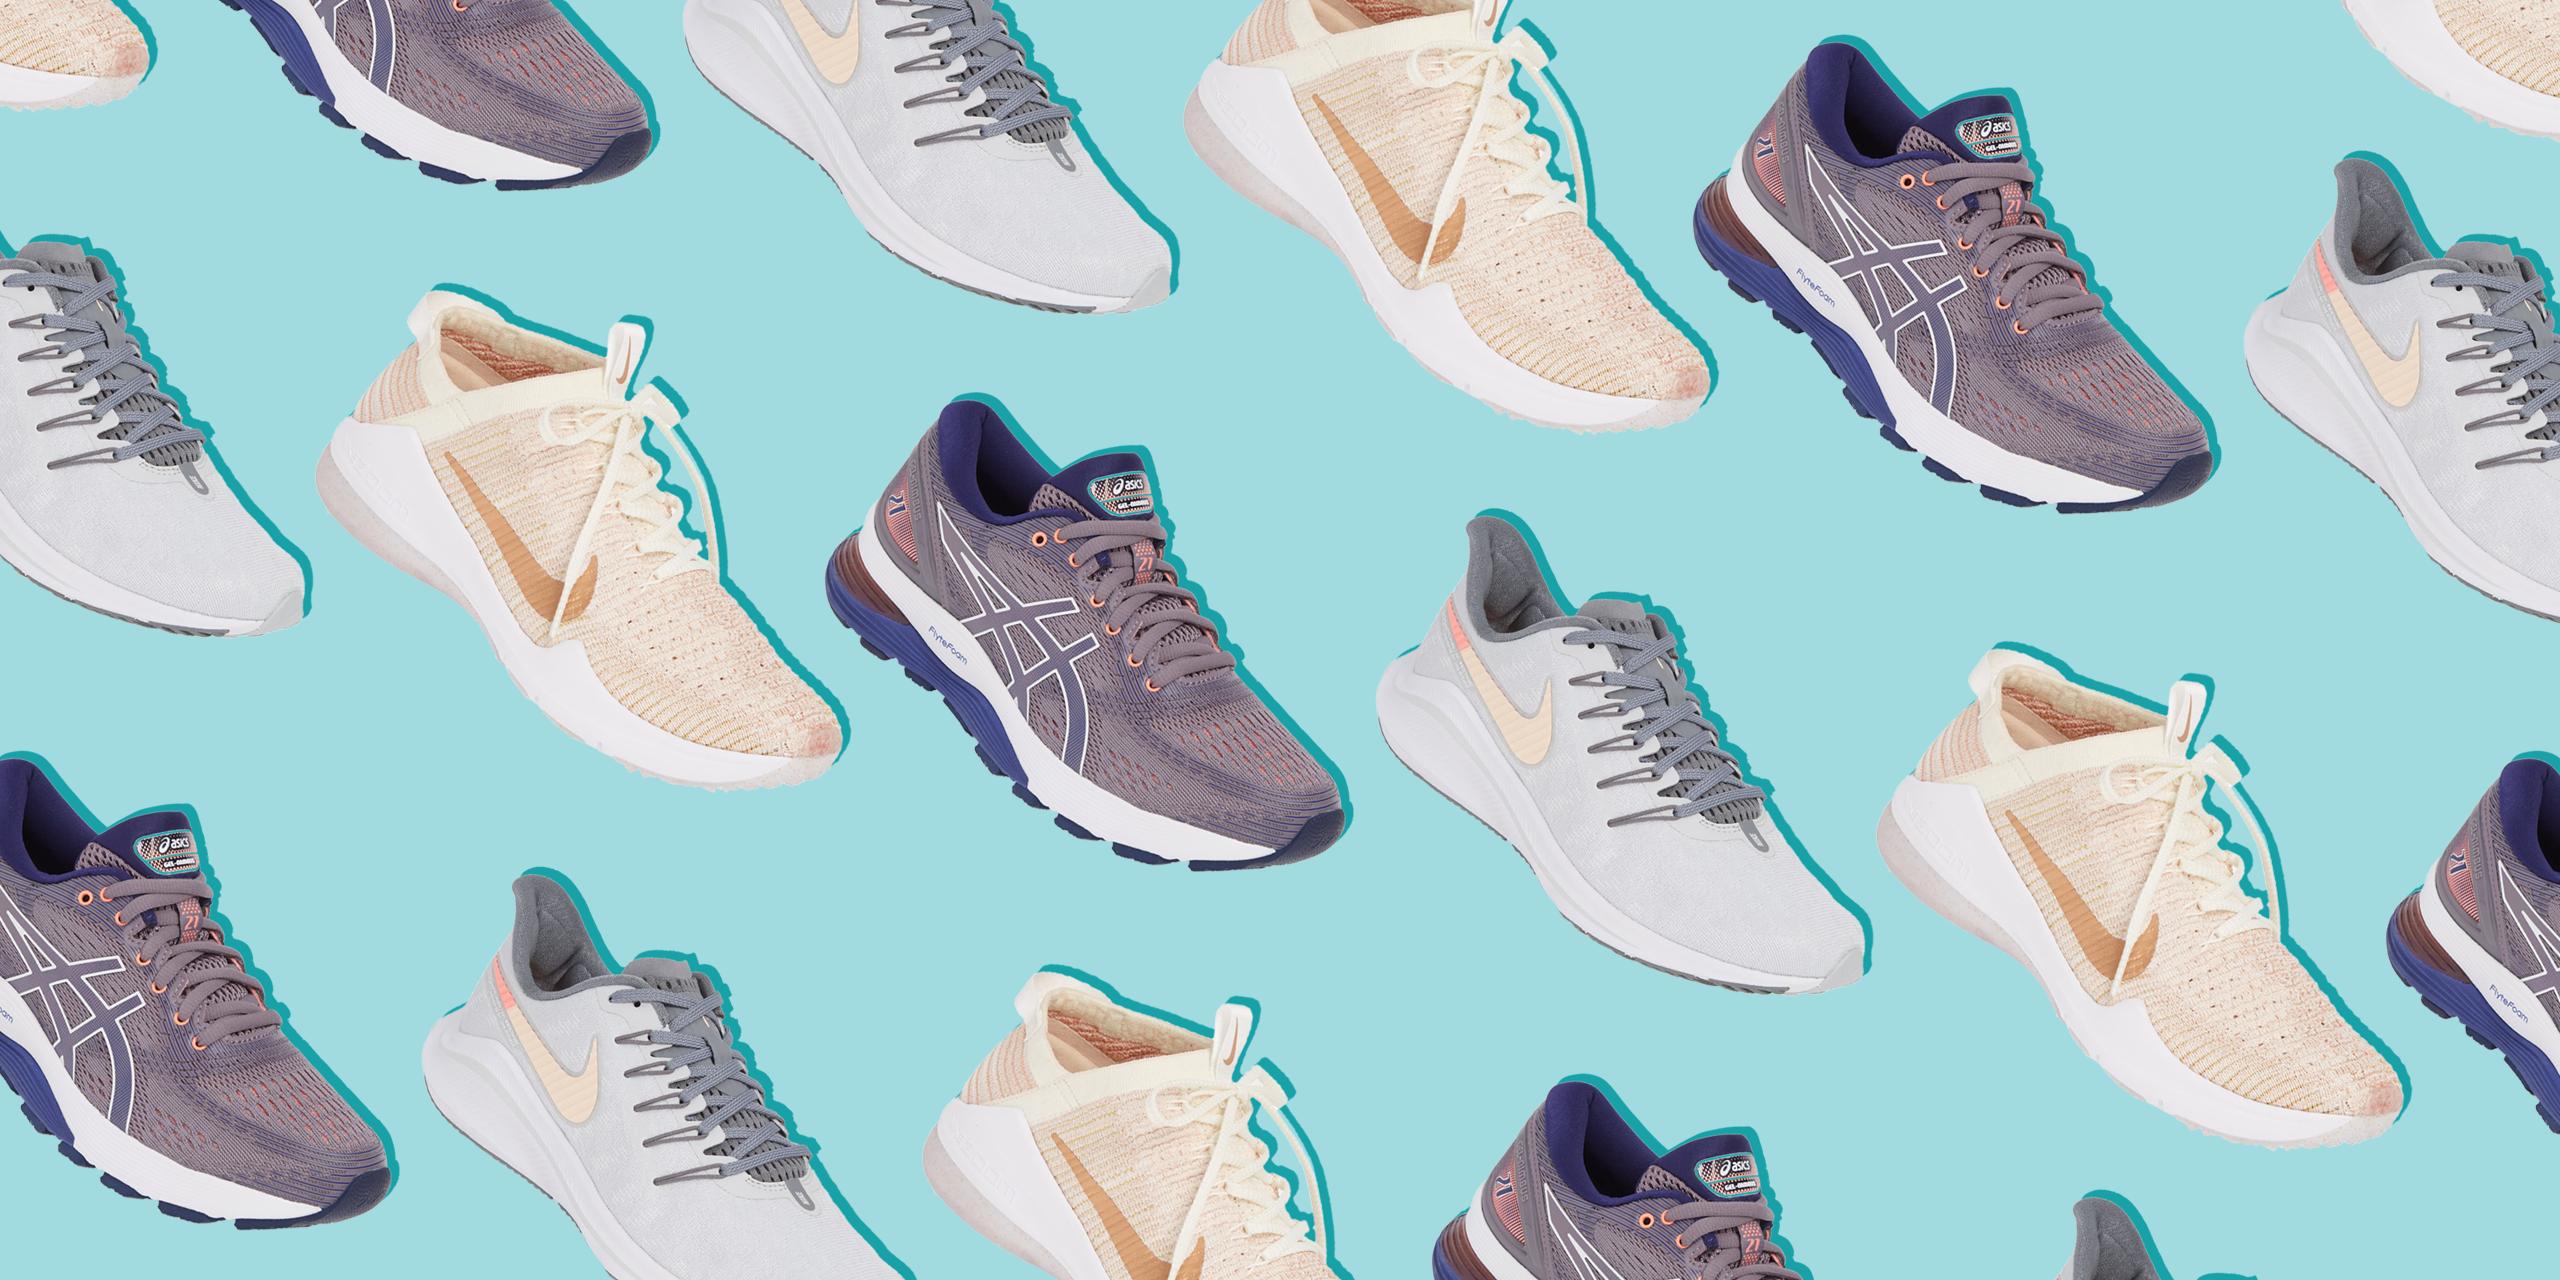 Nordstrom's Anniversary Sale 2019: Best Walking & Running Shoes